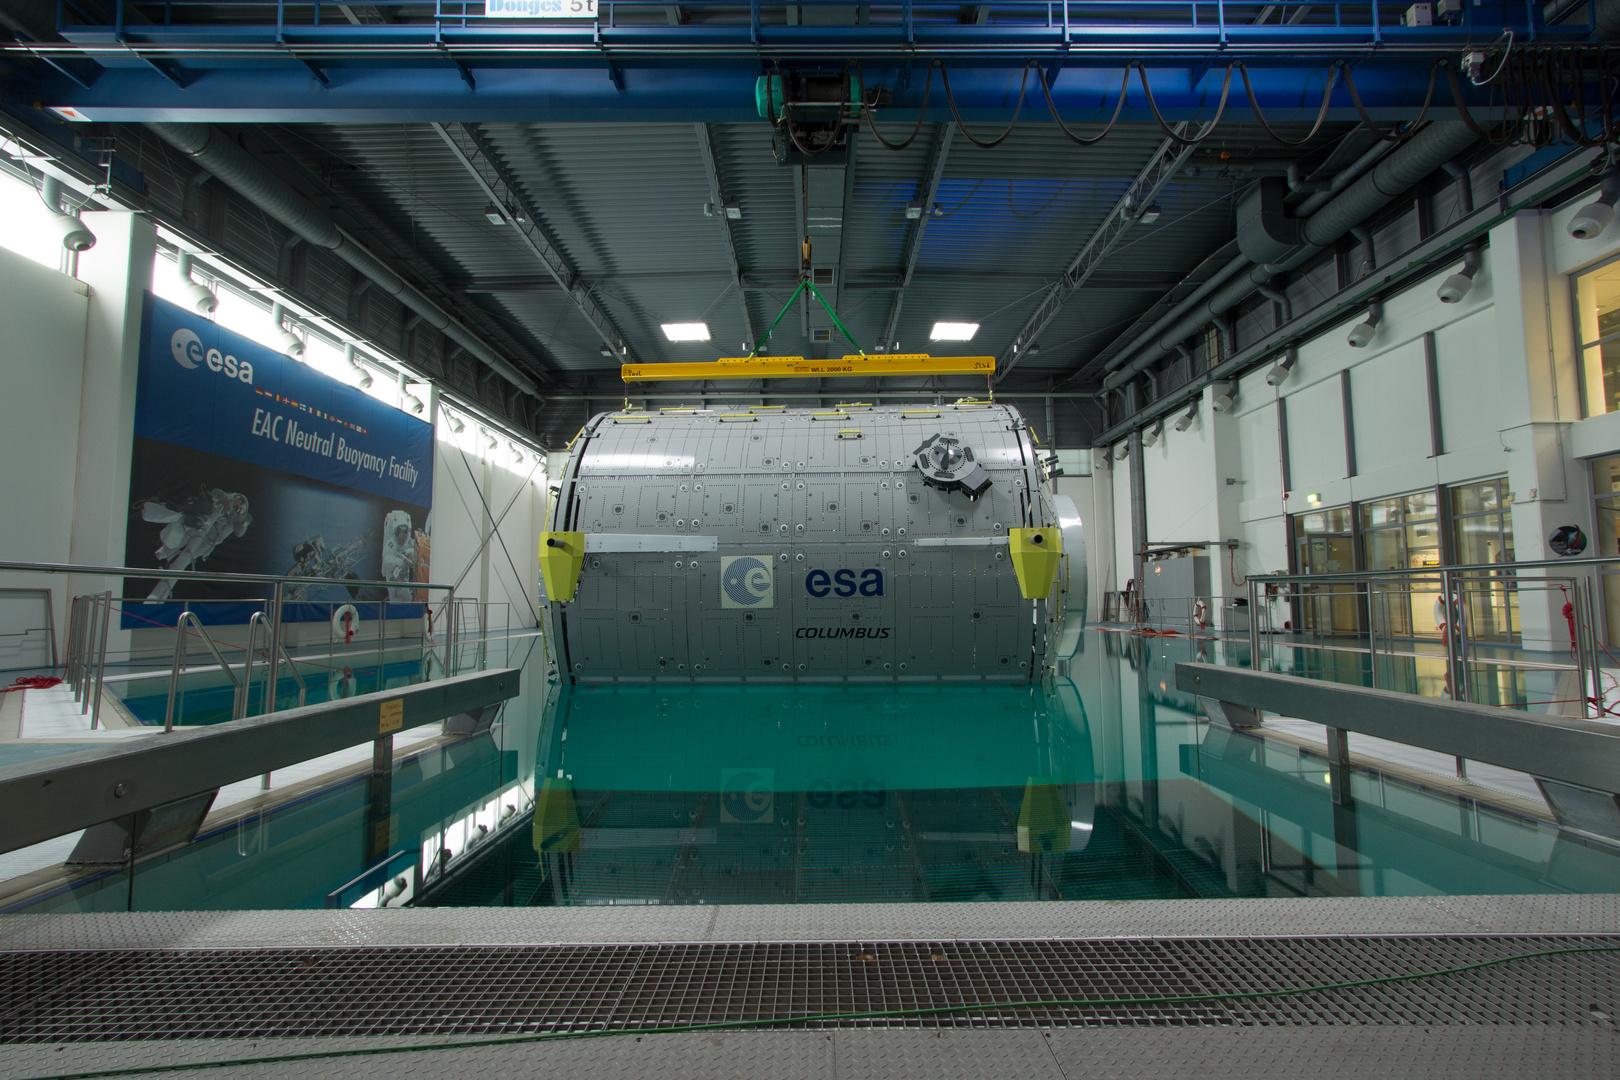 Columbus Modell der Neutral Buoyancy Facility (NBF) der ESA in Köln